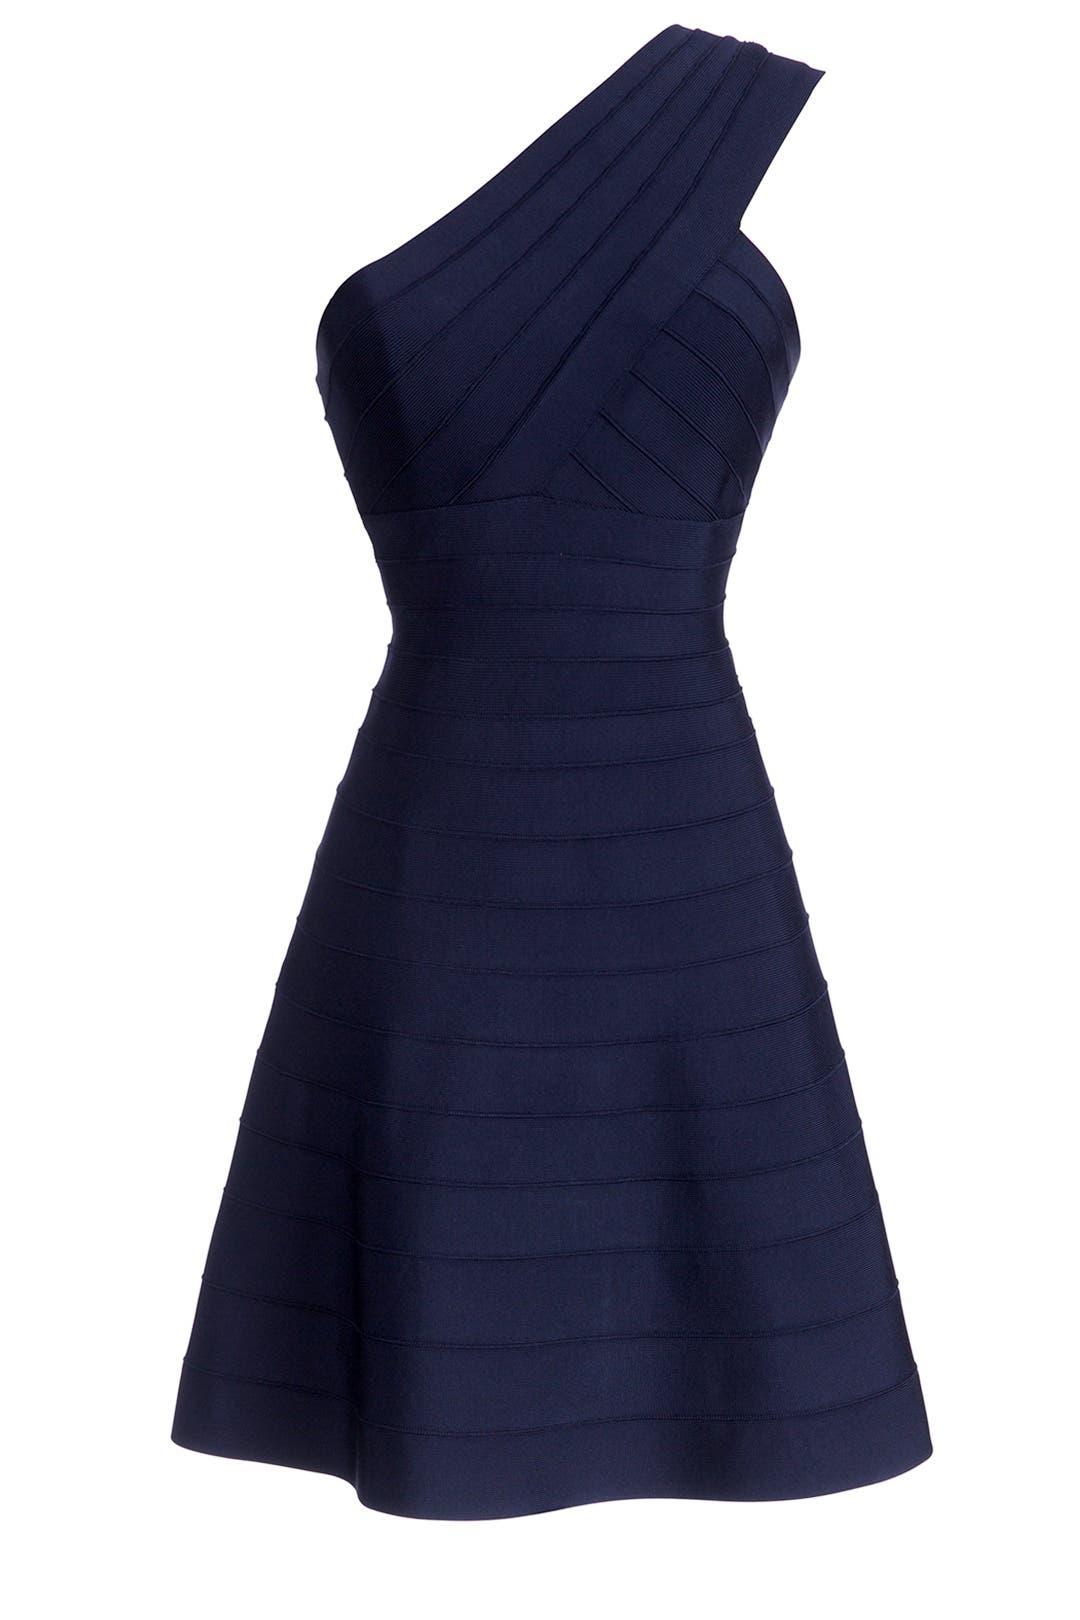 Sydney Dress by Hervé Léger for $65 - $190 - Rent the Runway